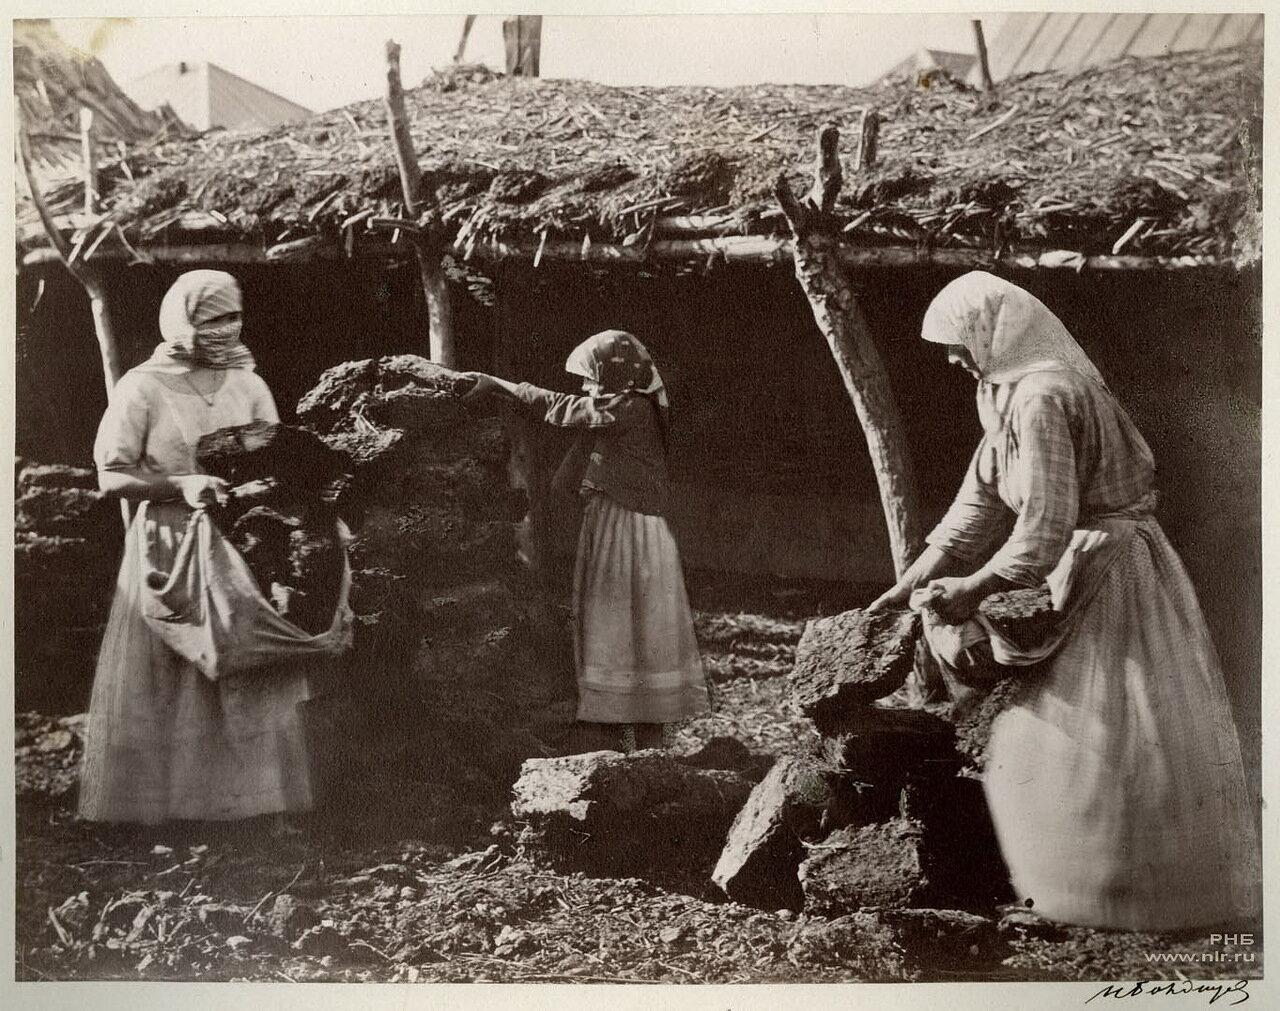 Казачки сносят кизяки в катух (сарай). Цымлянская станица. 1875-1876